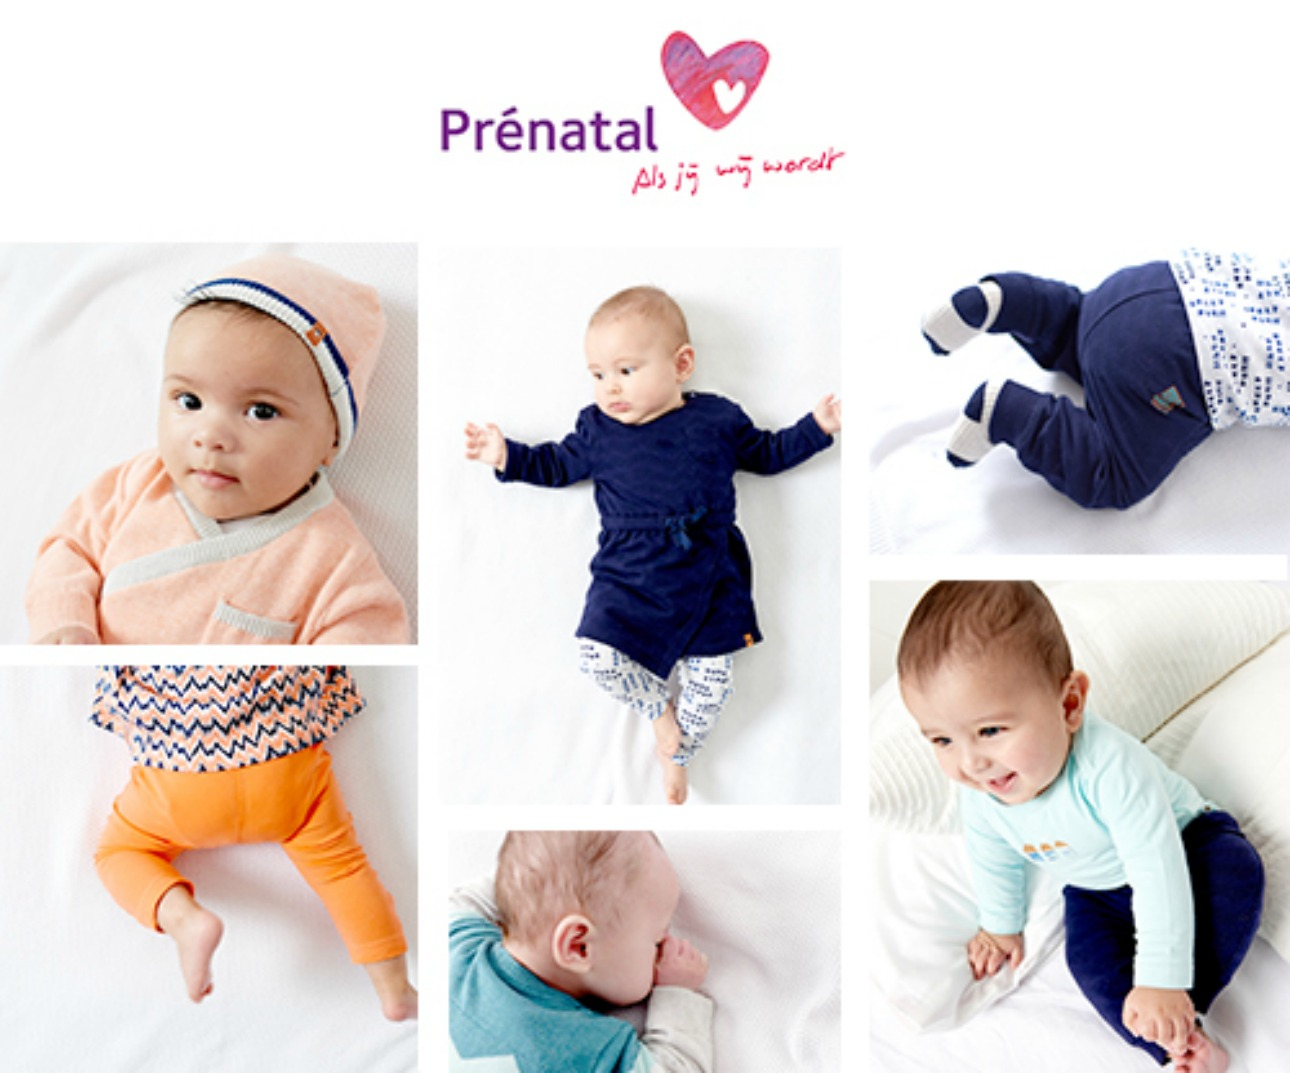 PB-Prenatal_SweetPetit6-01